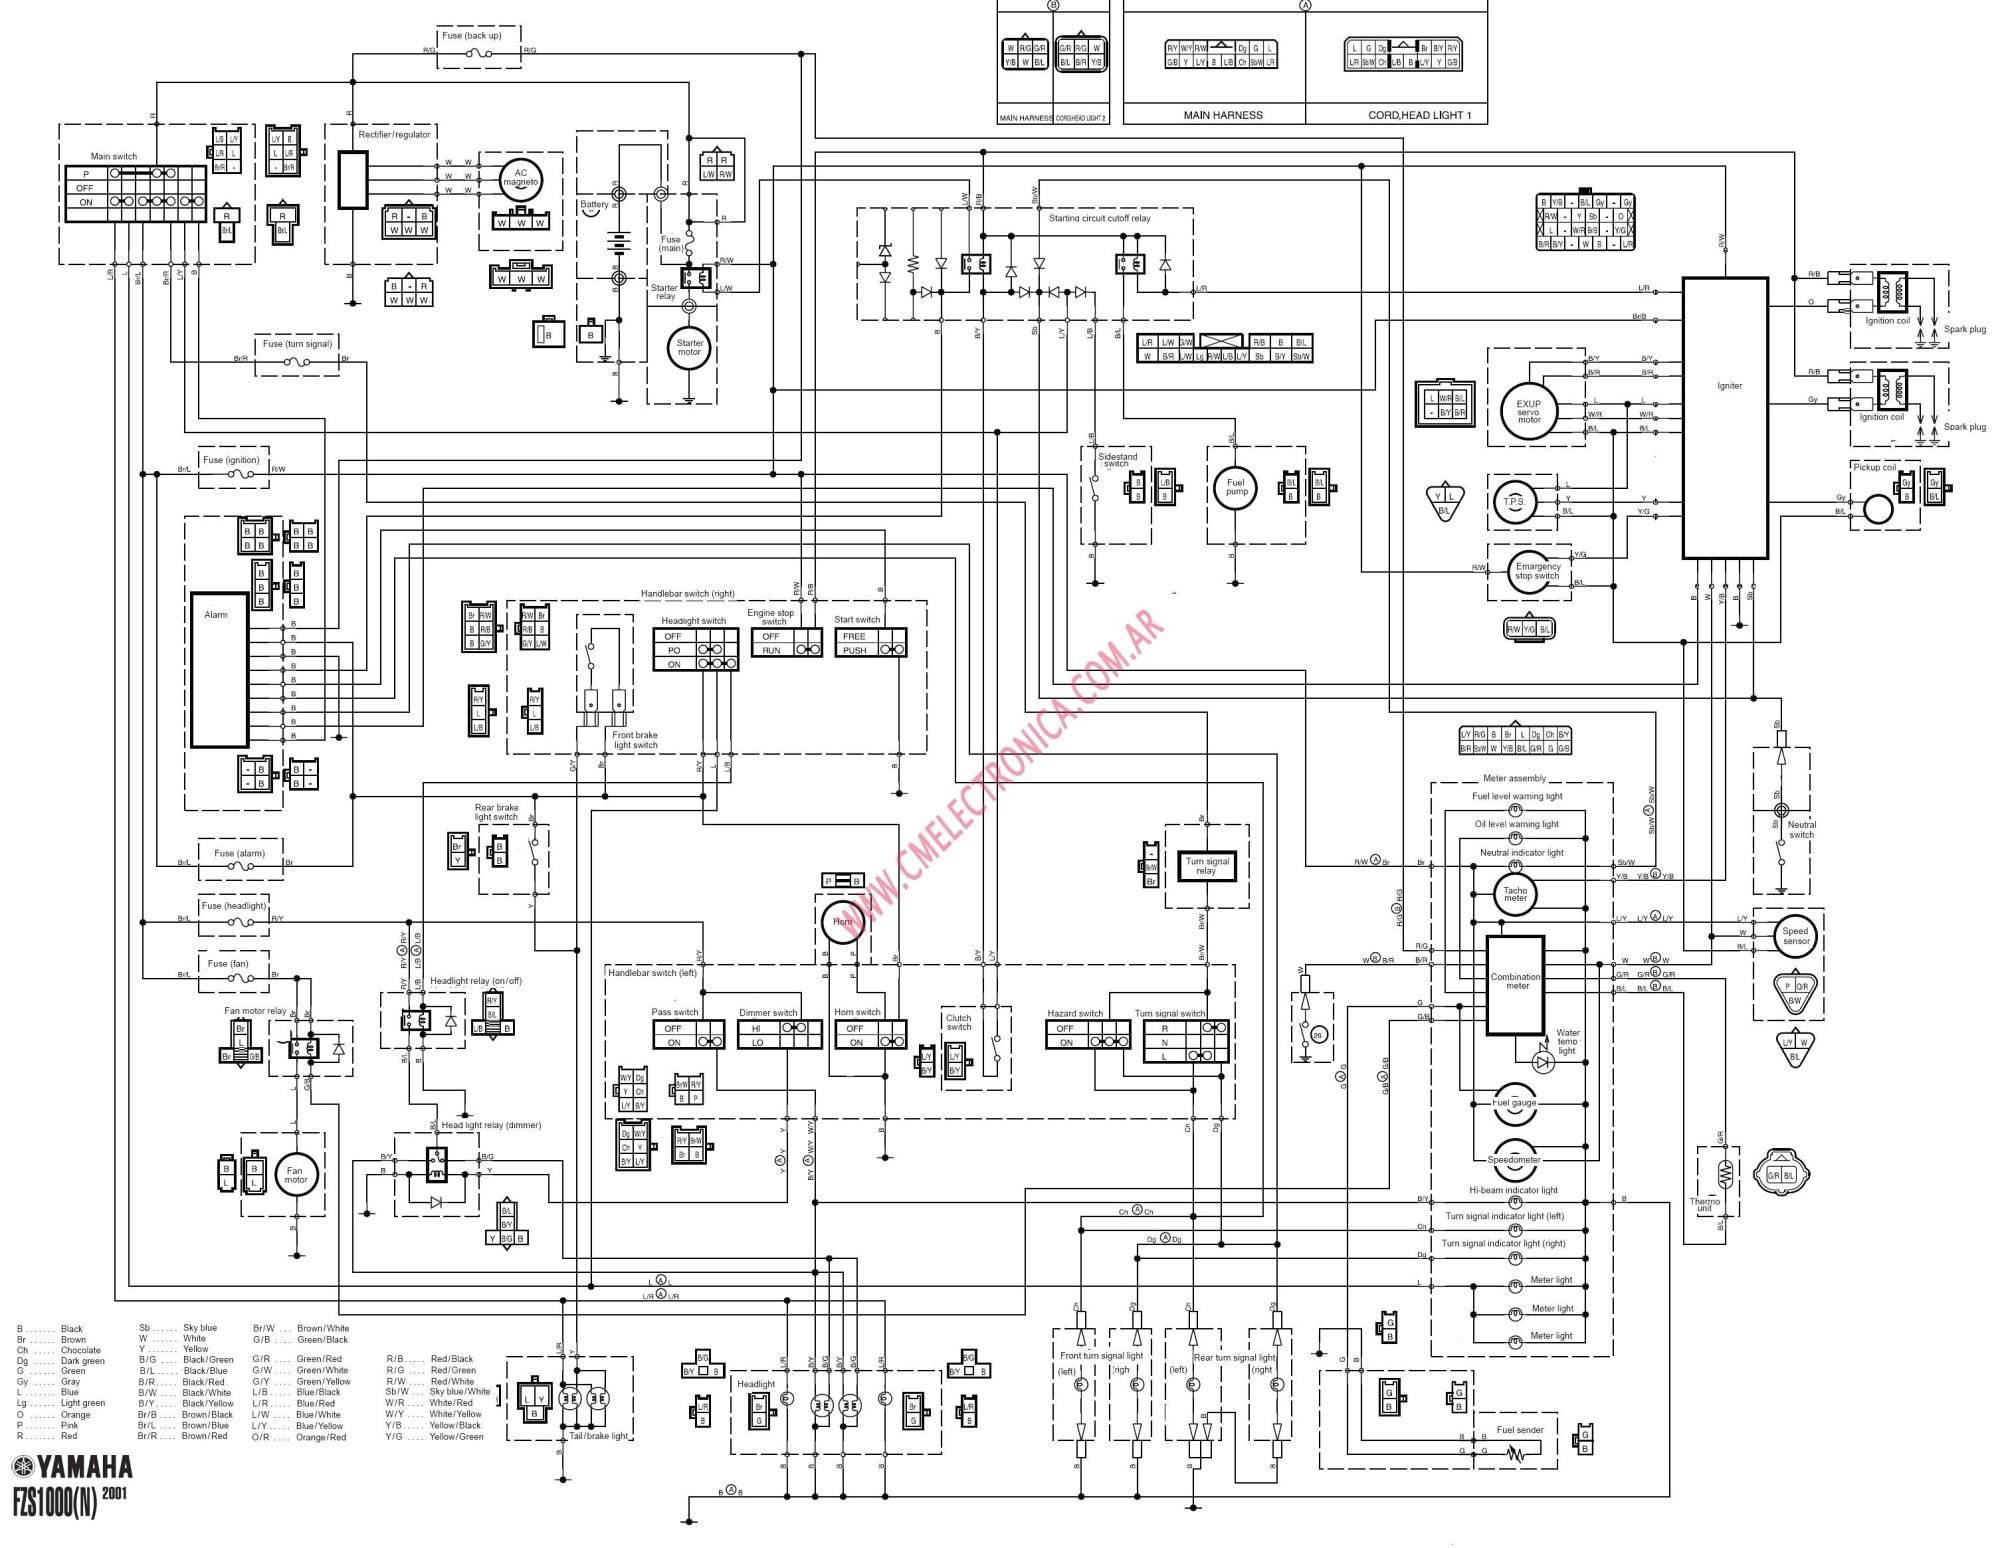 hight resolution of harley davidson coil wiring diagram luxury harley davidson coil wiring diagram inspirational magnificent harley harley davidson voltage regulator